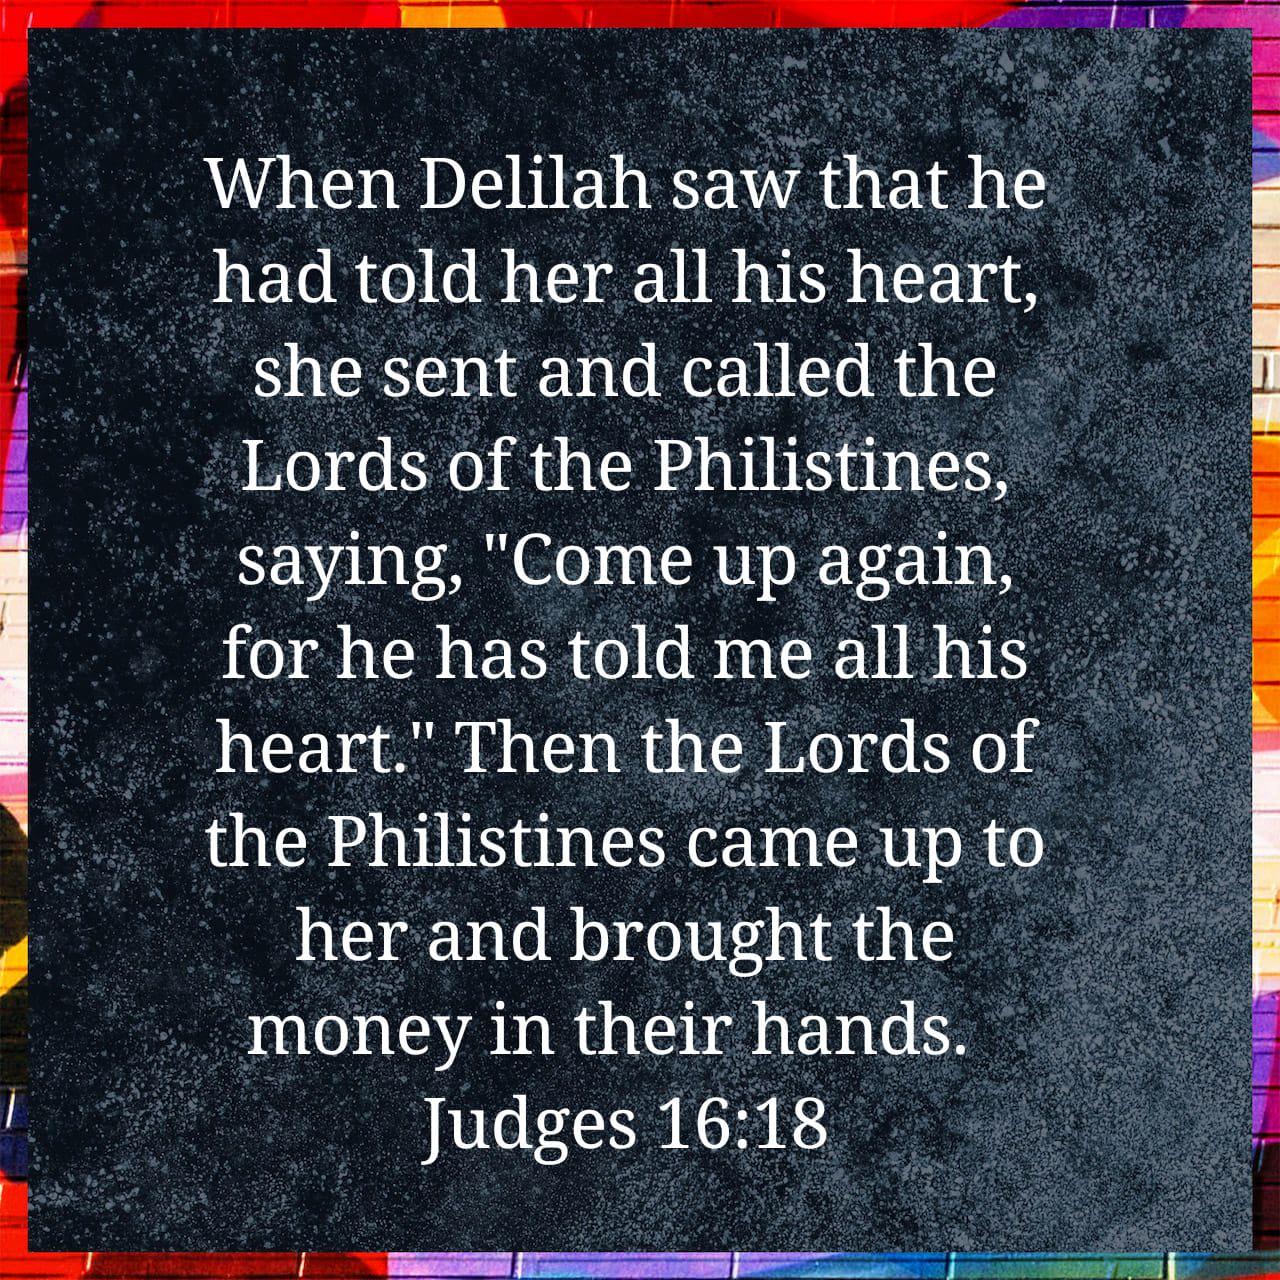 Judges 16:18